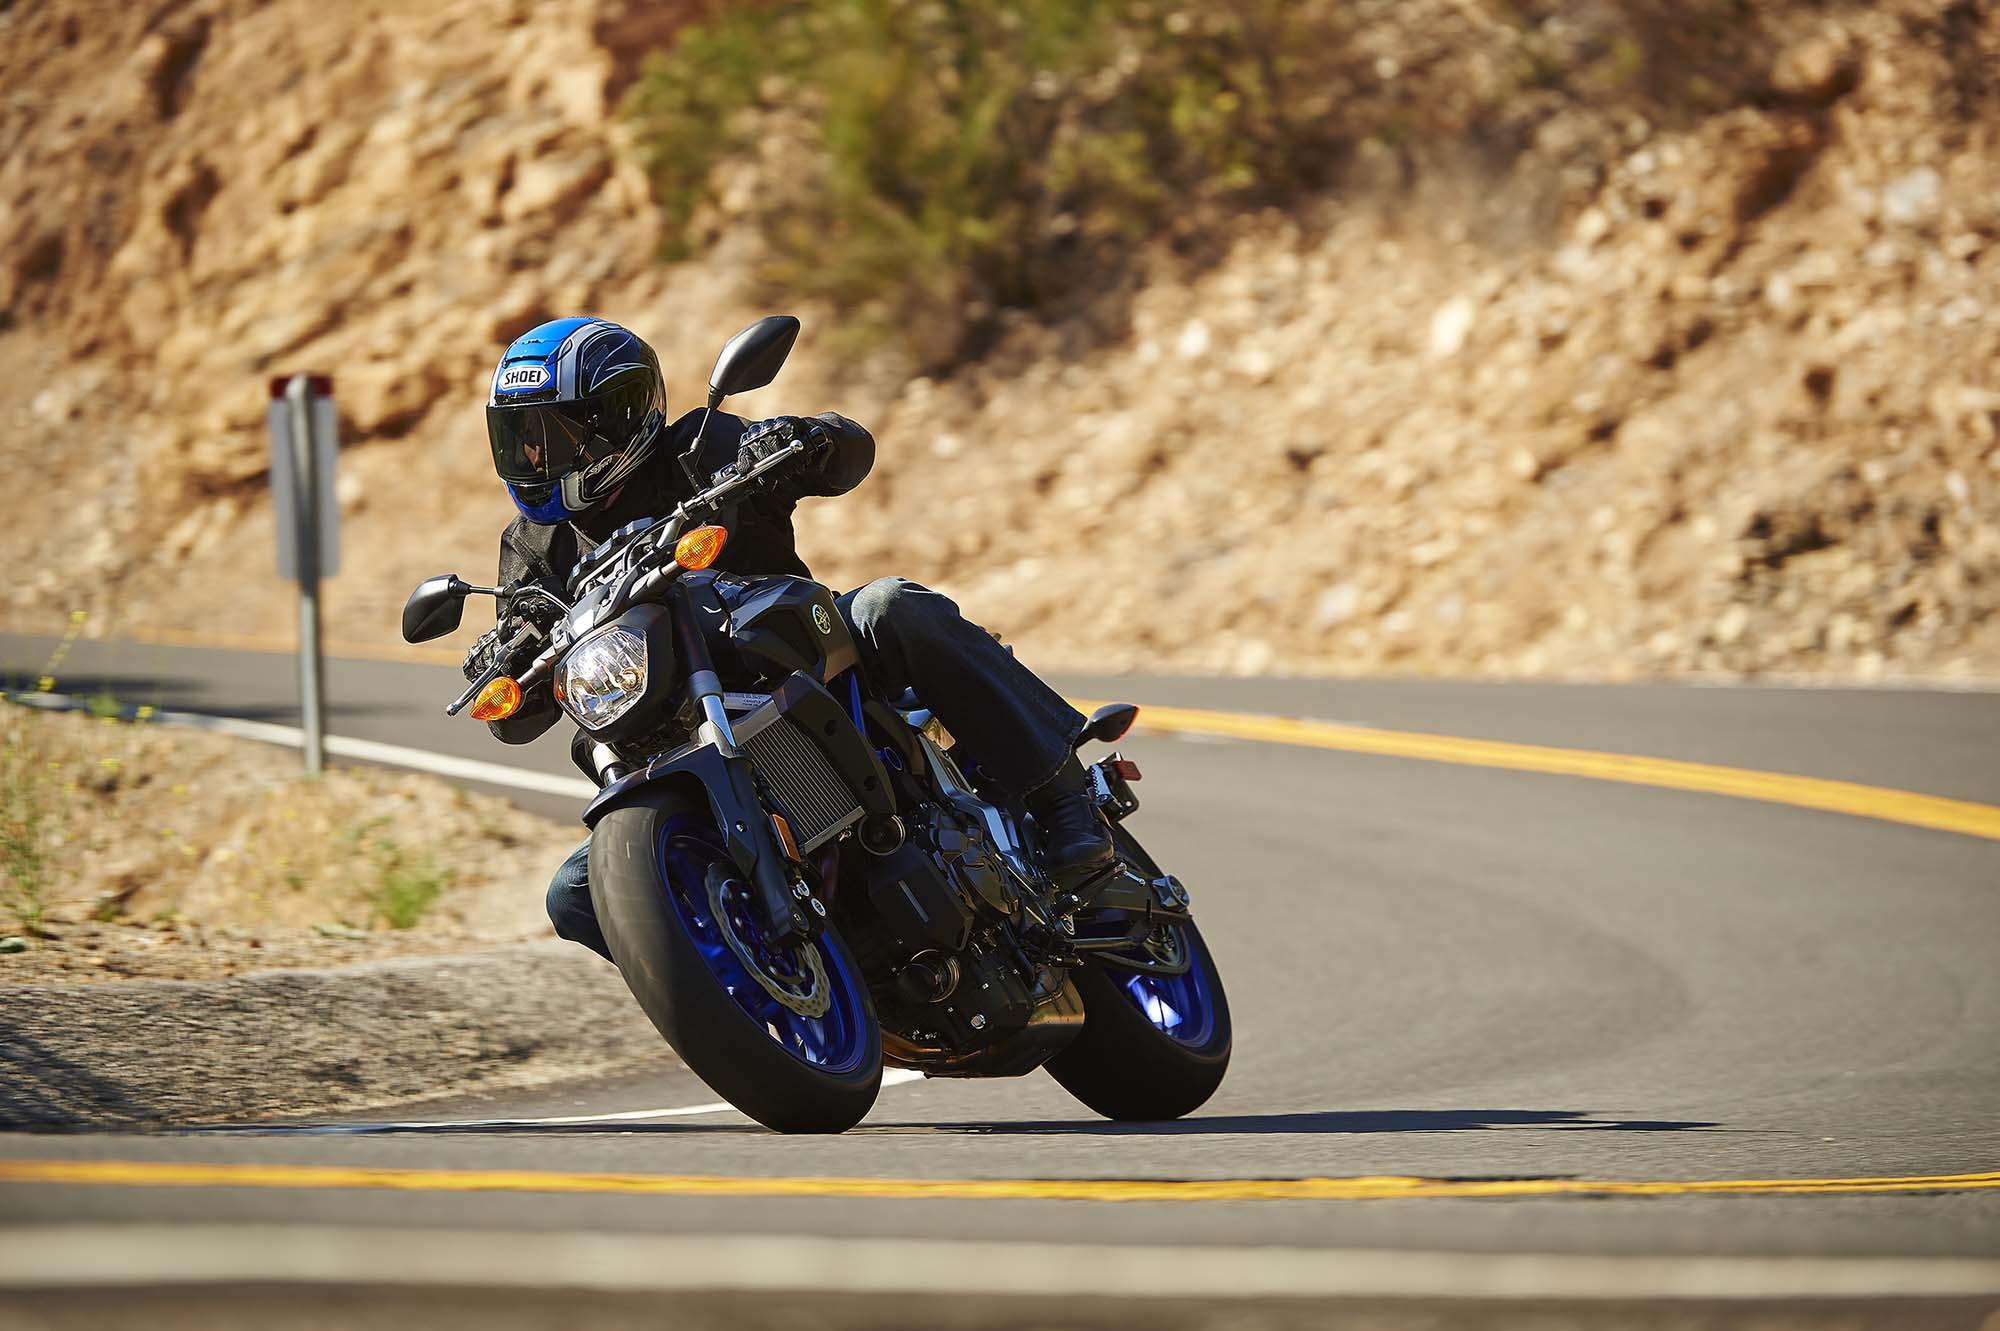 2015-2019 Yamaha FZ-07 / MT-07 / XSR700 M4 Carbon Fiber